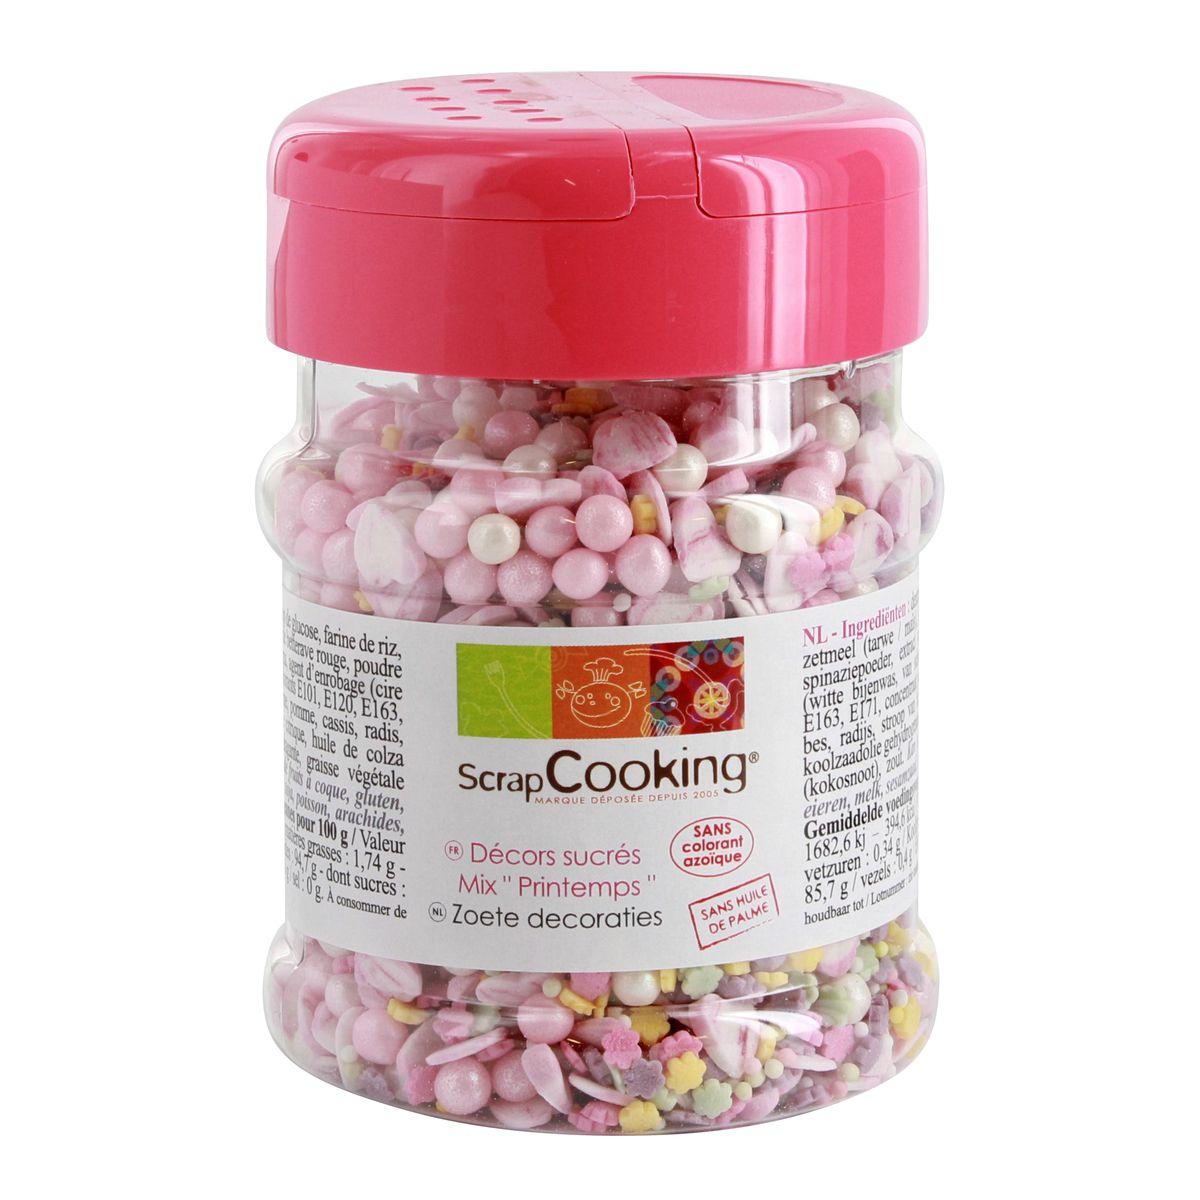 Pot de décors sucres mix printemps 150gr - Scrapcooking